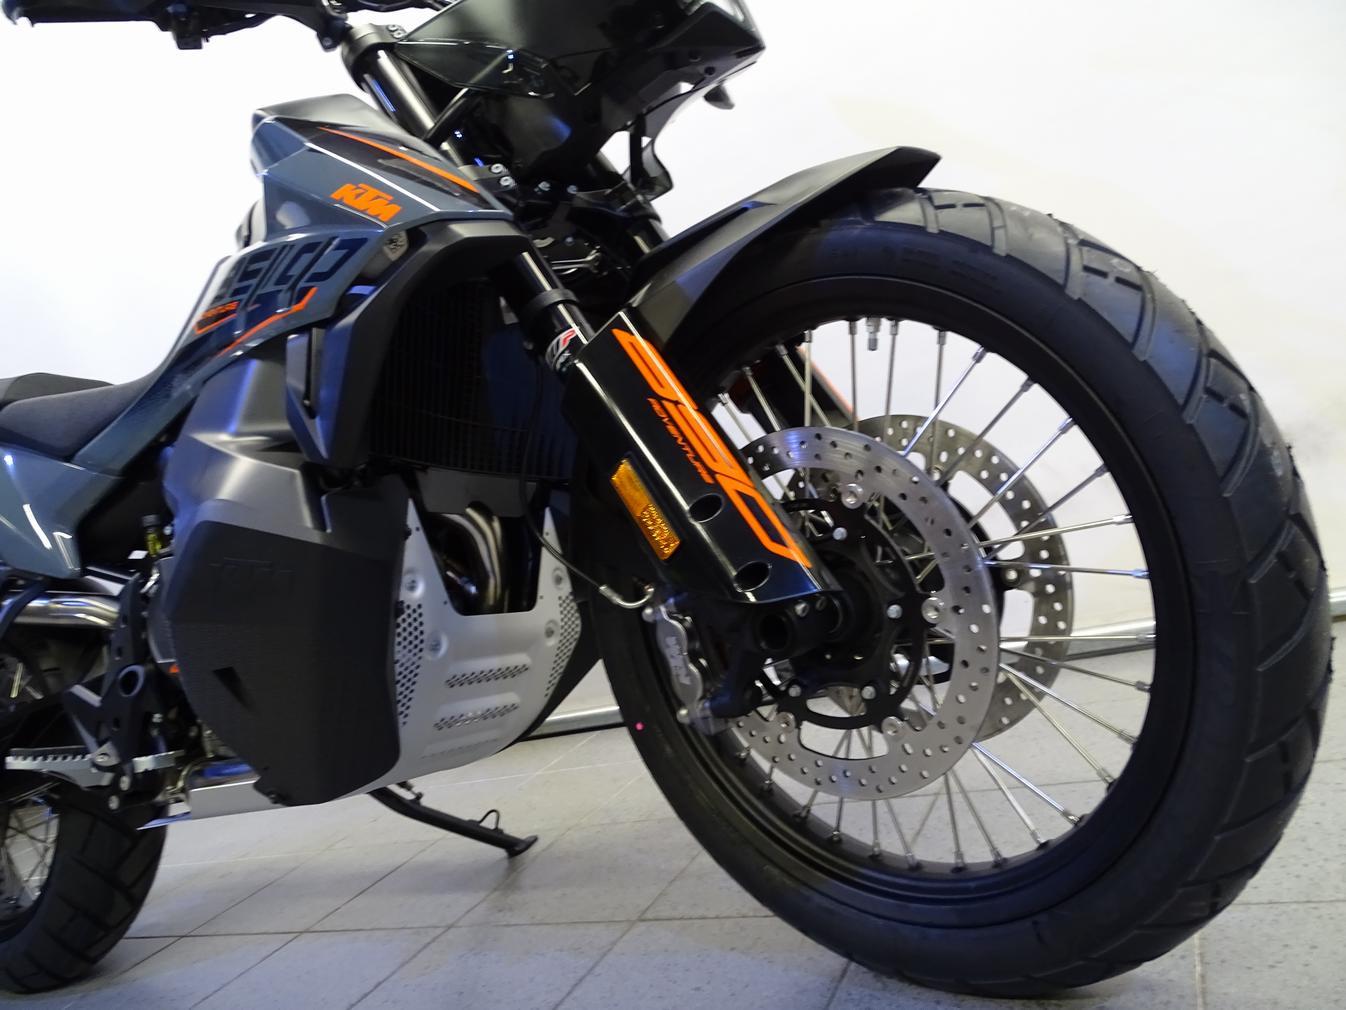 KTM - 890 ADVENTURE L